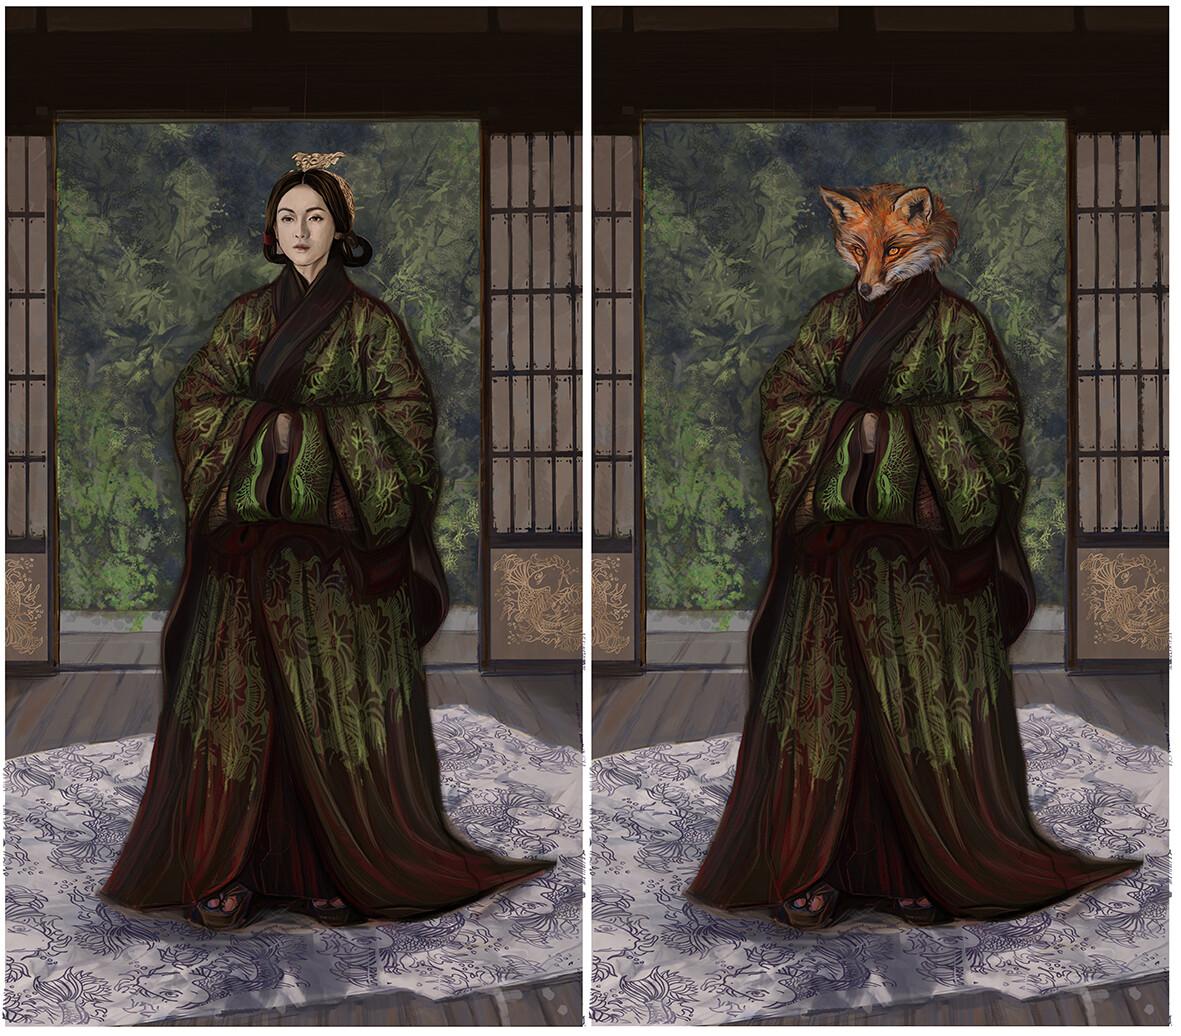 Kitsune / Huli jing